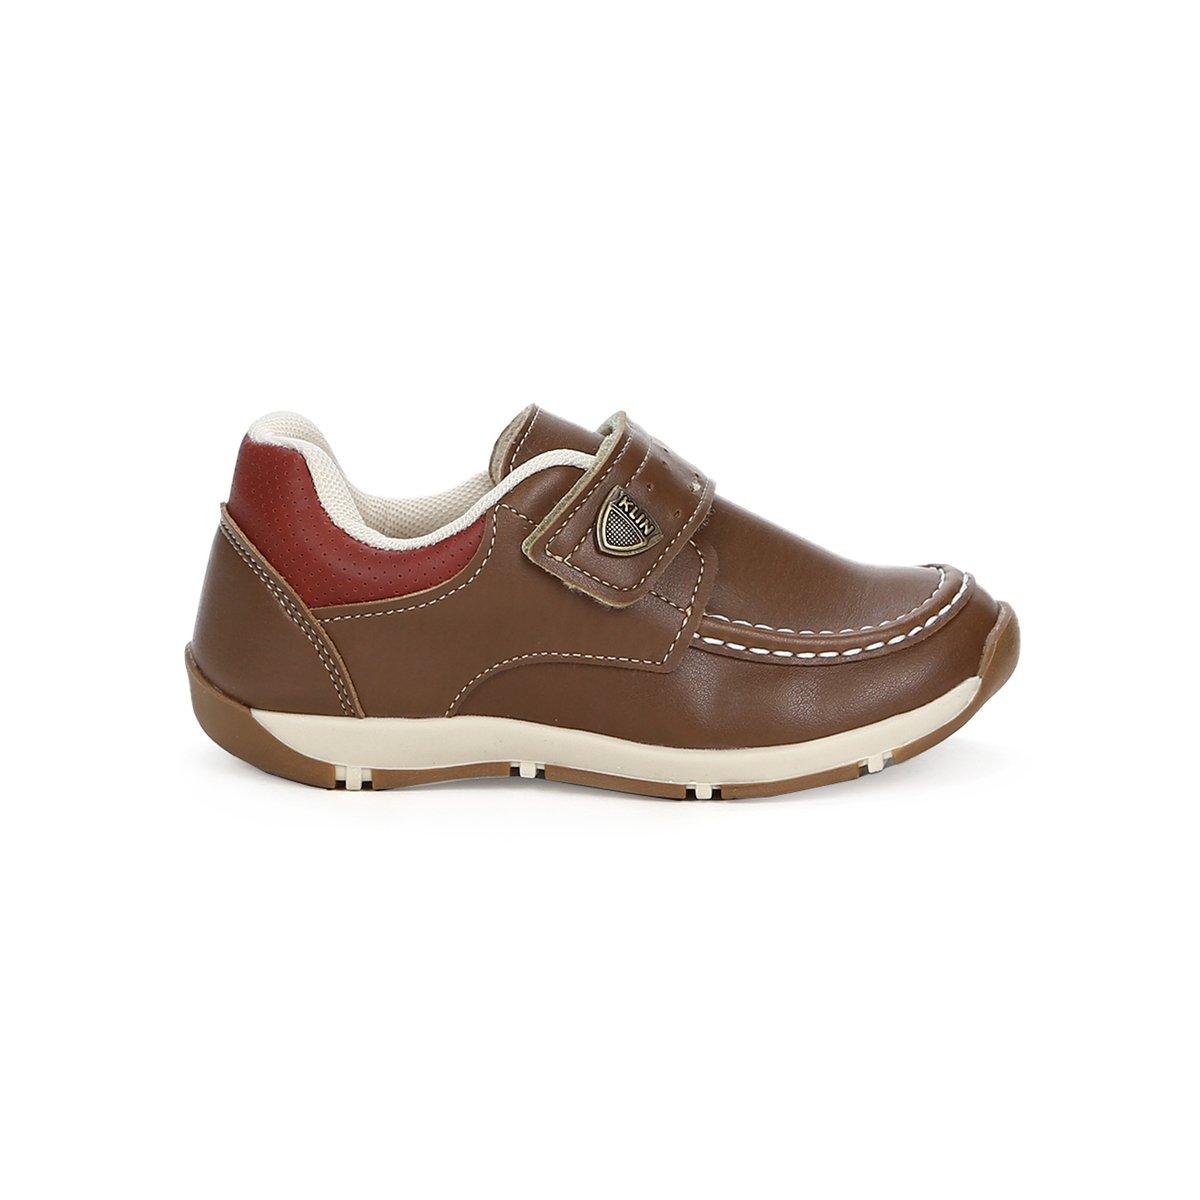 6b875c1353a36 Sapato Infantil Para Bebê Menino Klin - Compre Agora   Zattini